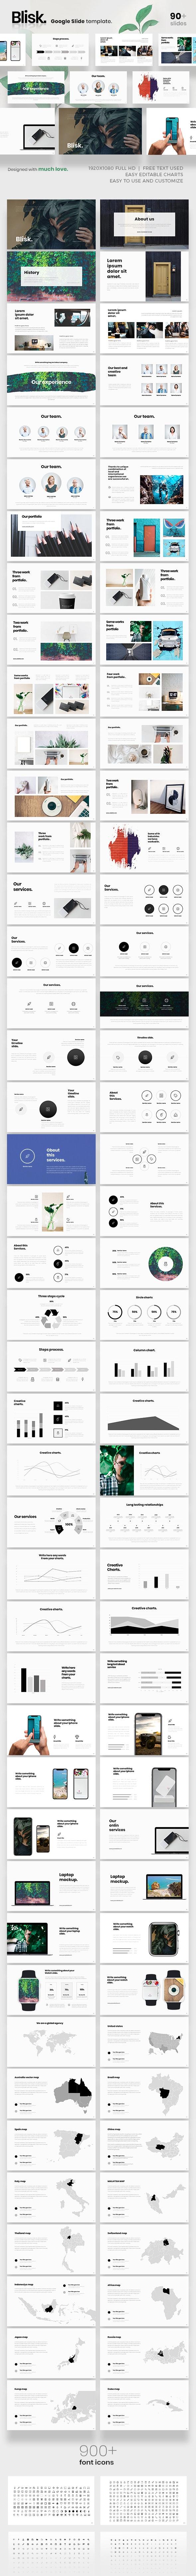 Blisk Google Slide Presentation Template - Google Slides Presentation Templates